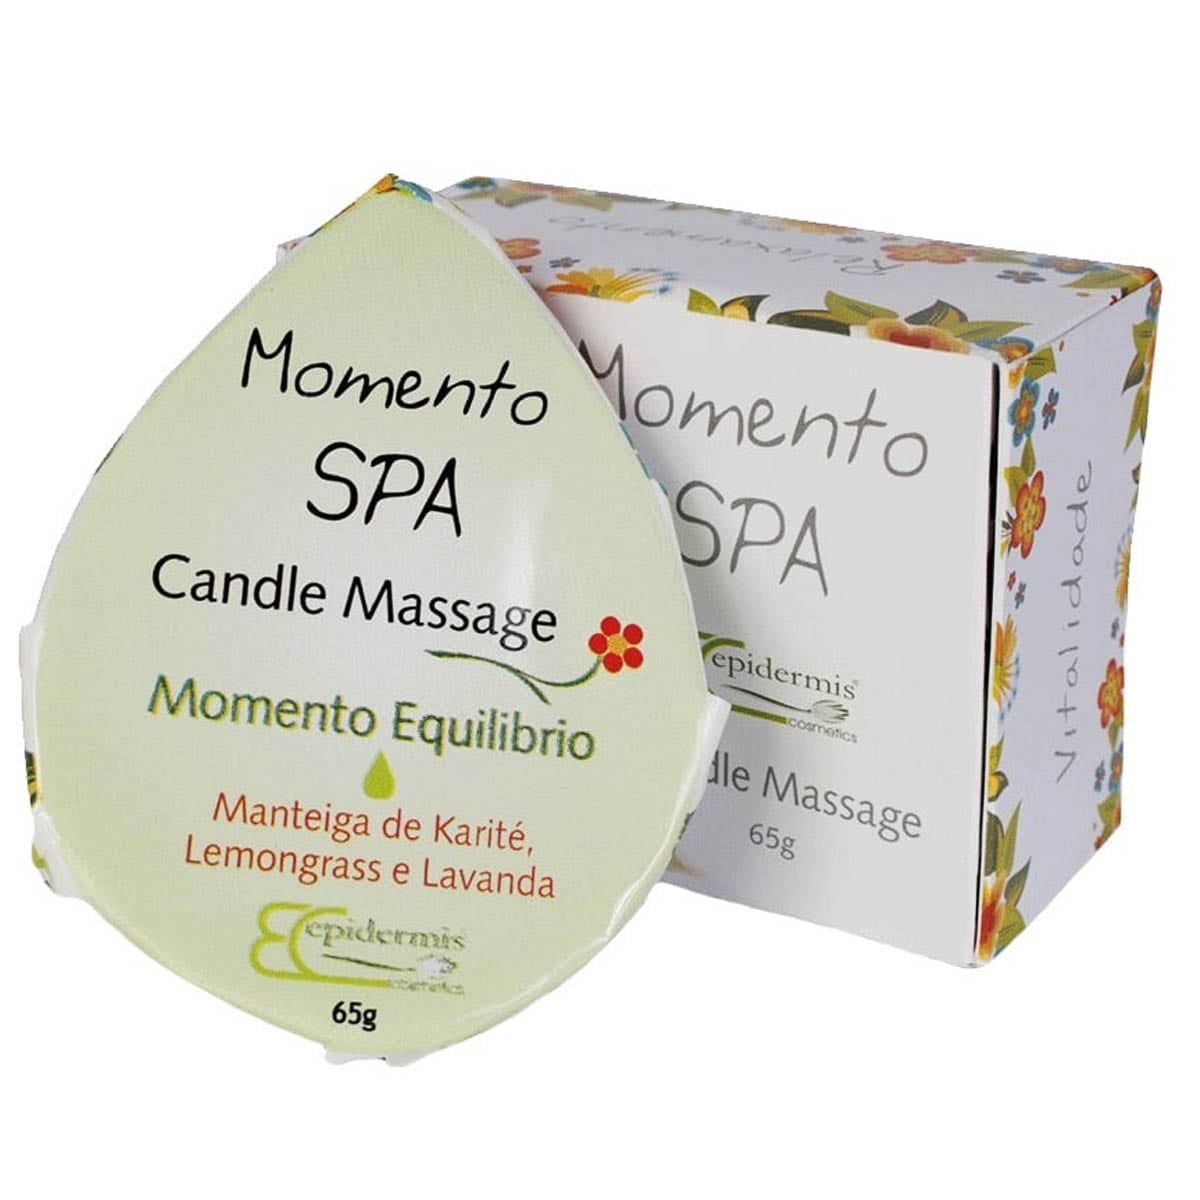 Candle momento equilíbrio 65g - Epidermis